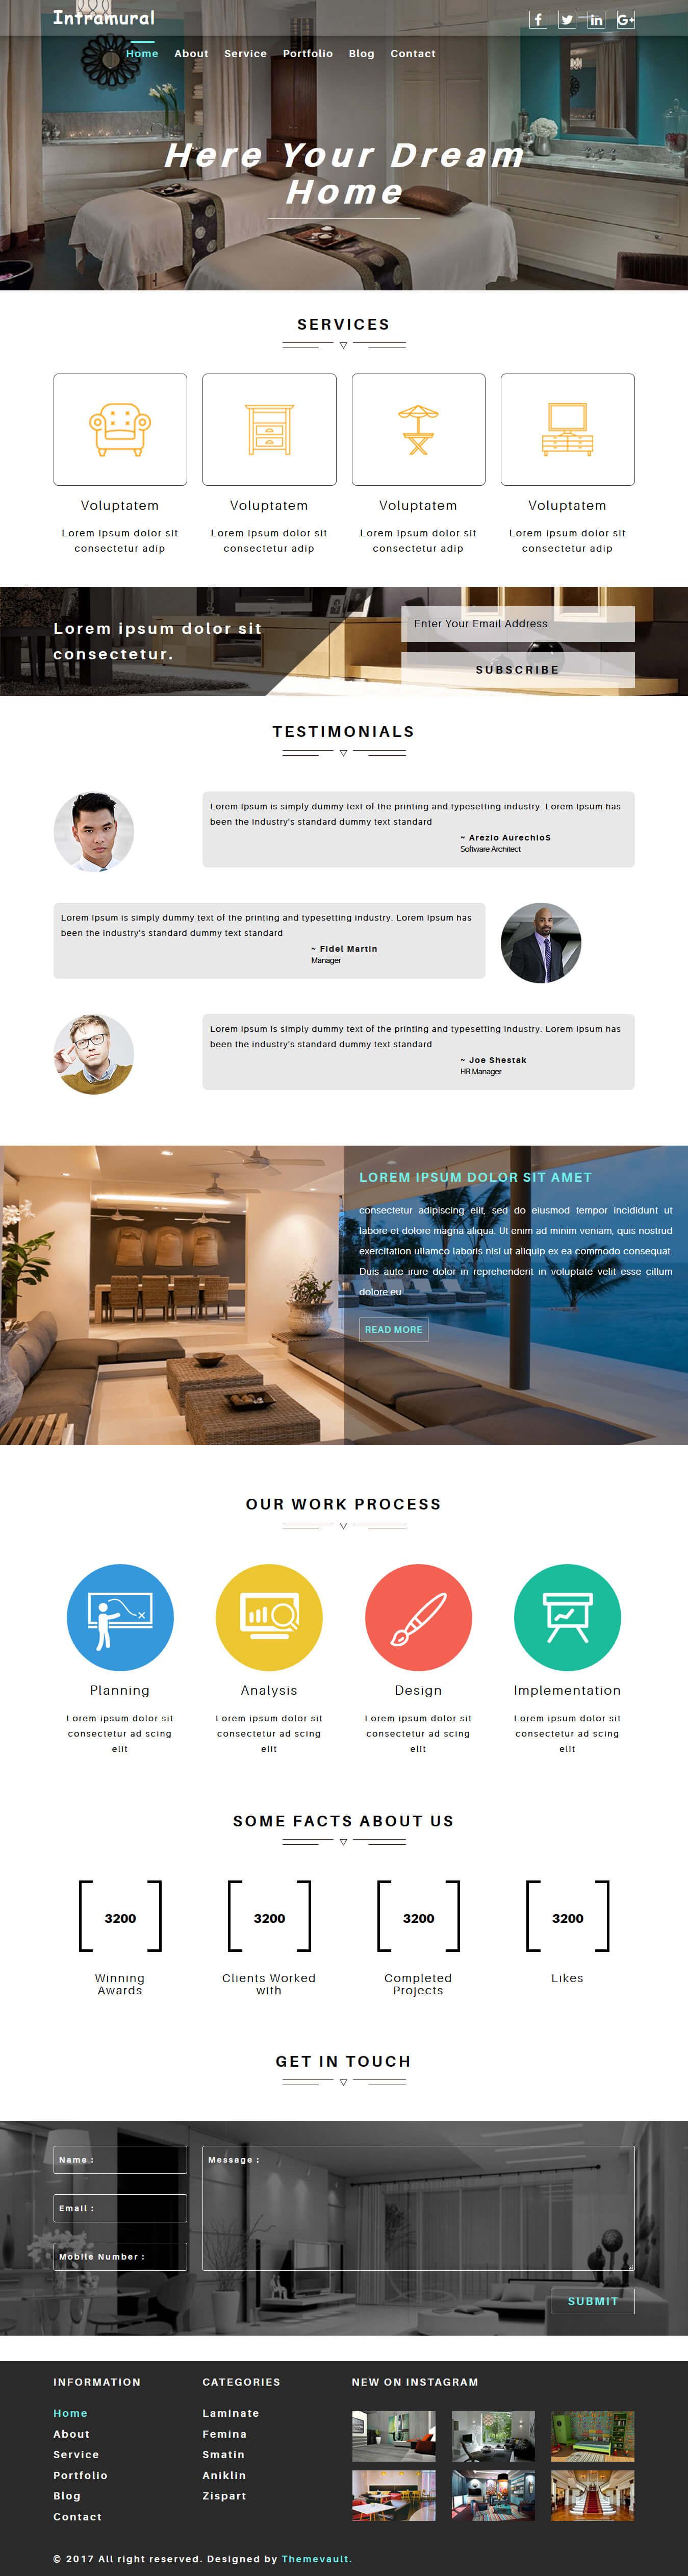 Intramural - Responsive Free Interior Design Website Template